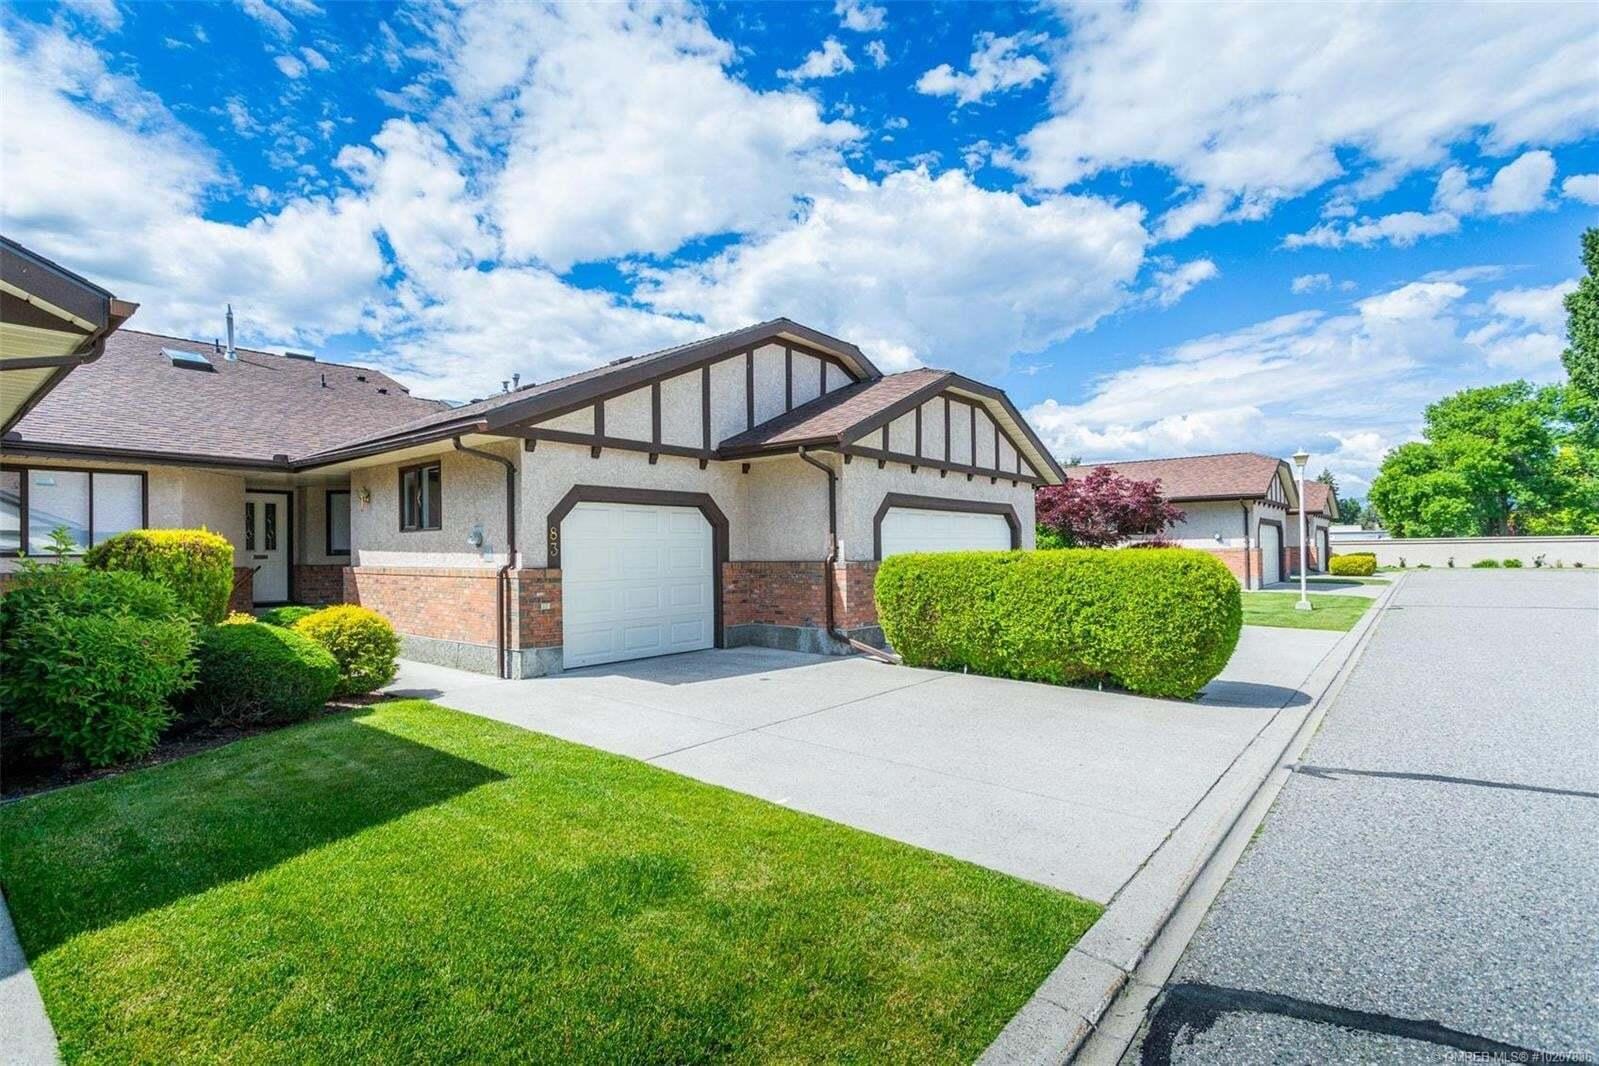 Townhouse for sale at 2200 Gordon Dr Kelowna British Columbia - MLS: 10207836